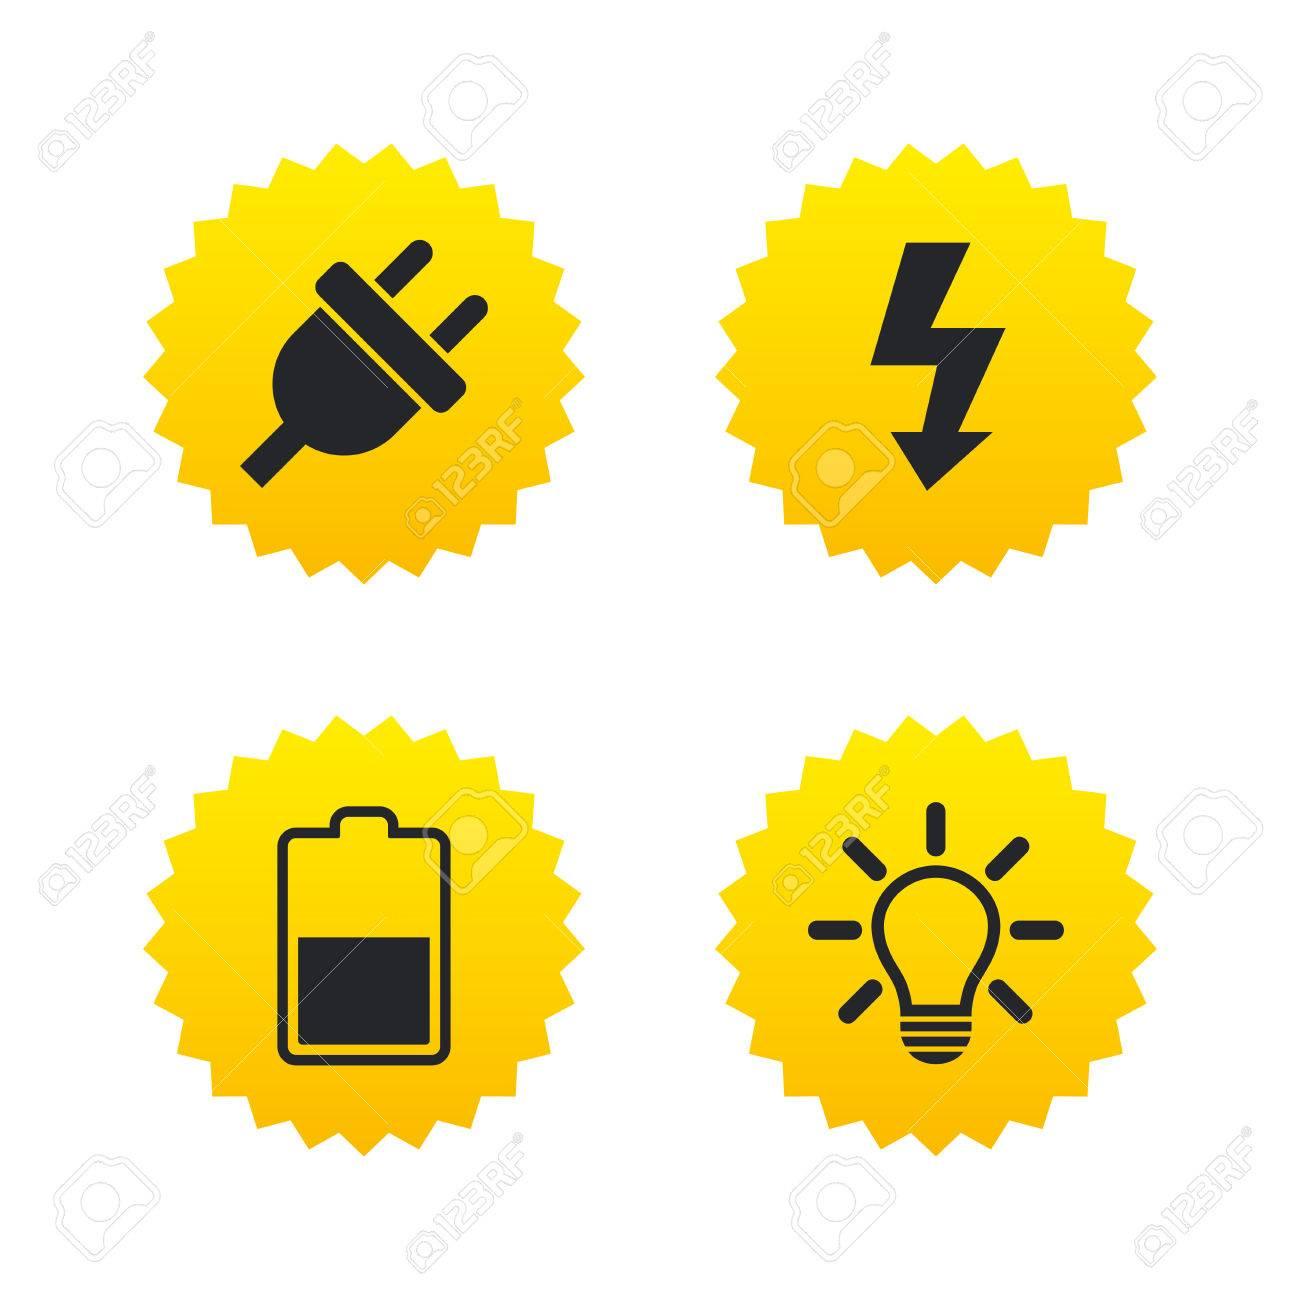 Electric Plug Icon. Light Lamp And Battery Half Symbols. Low ...